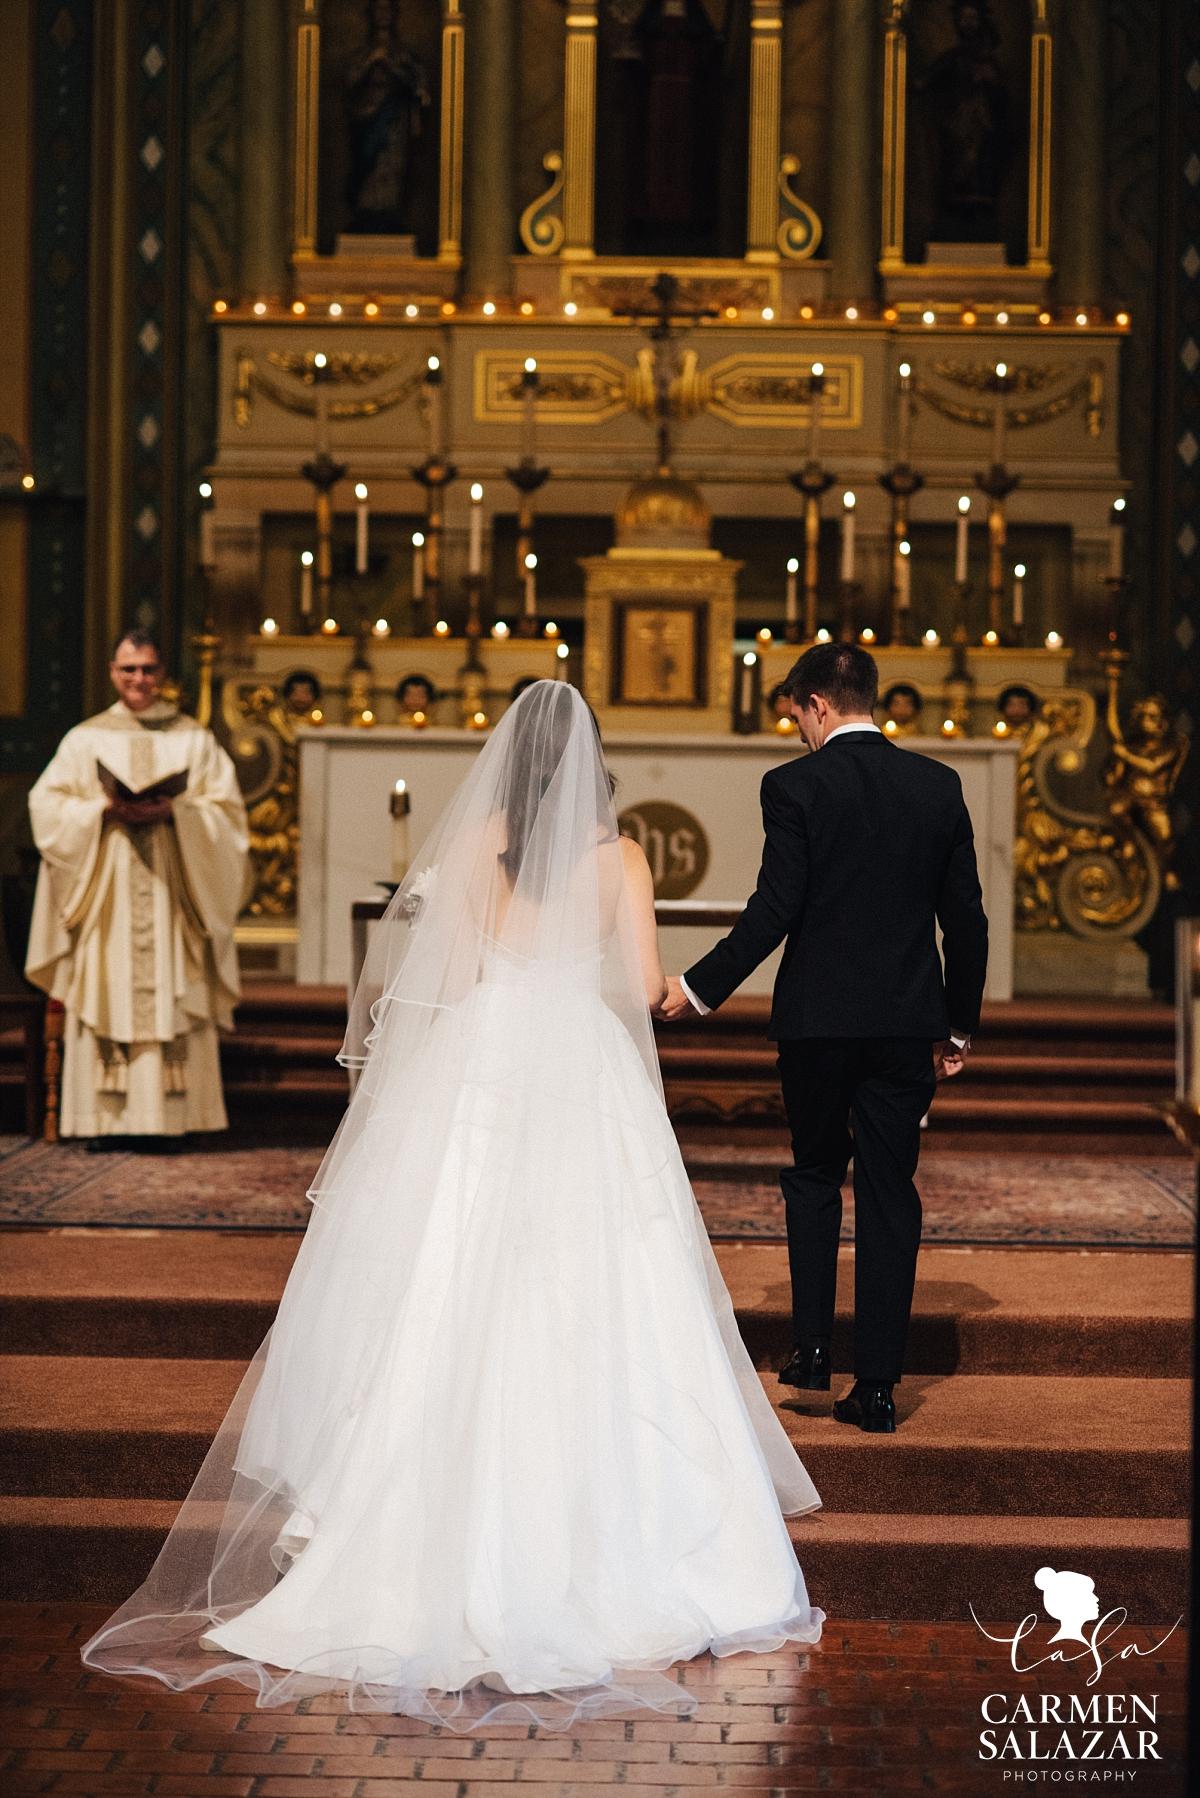 Bride arriving at wedding altar - Carmen Salazar